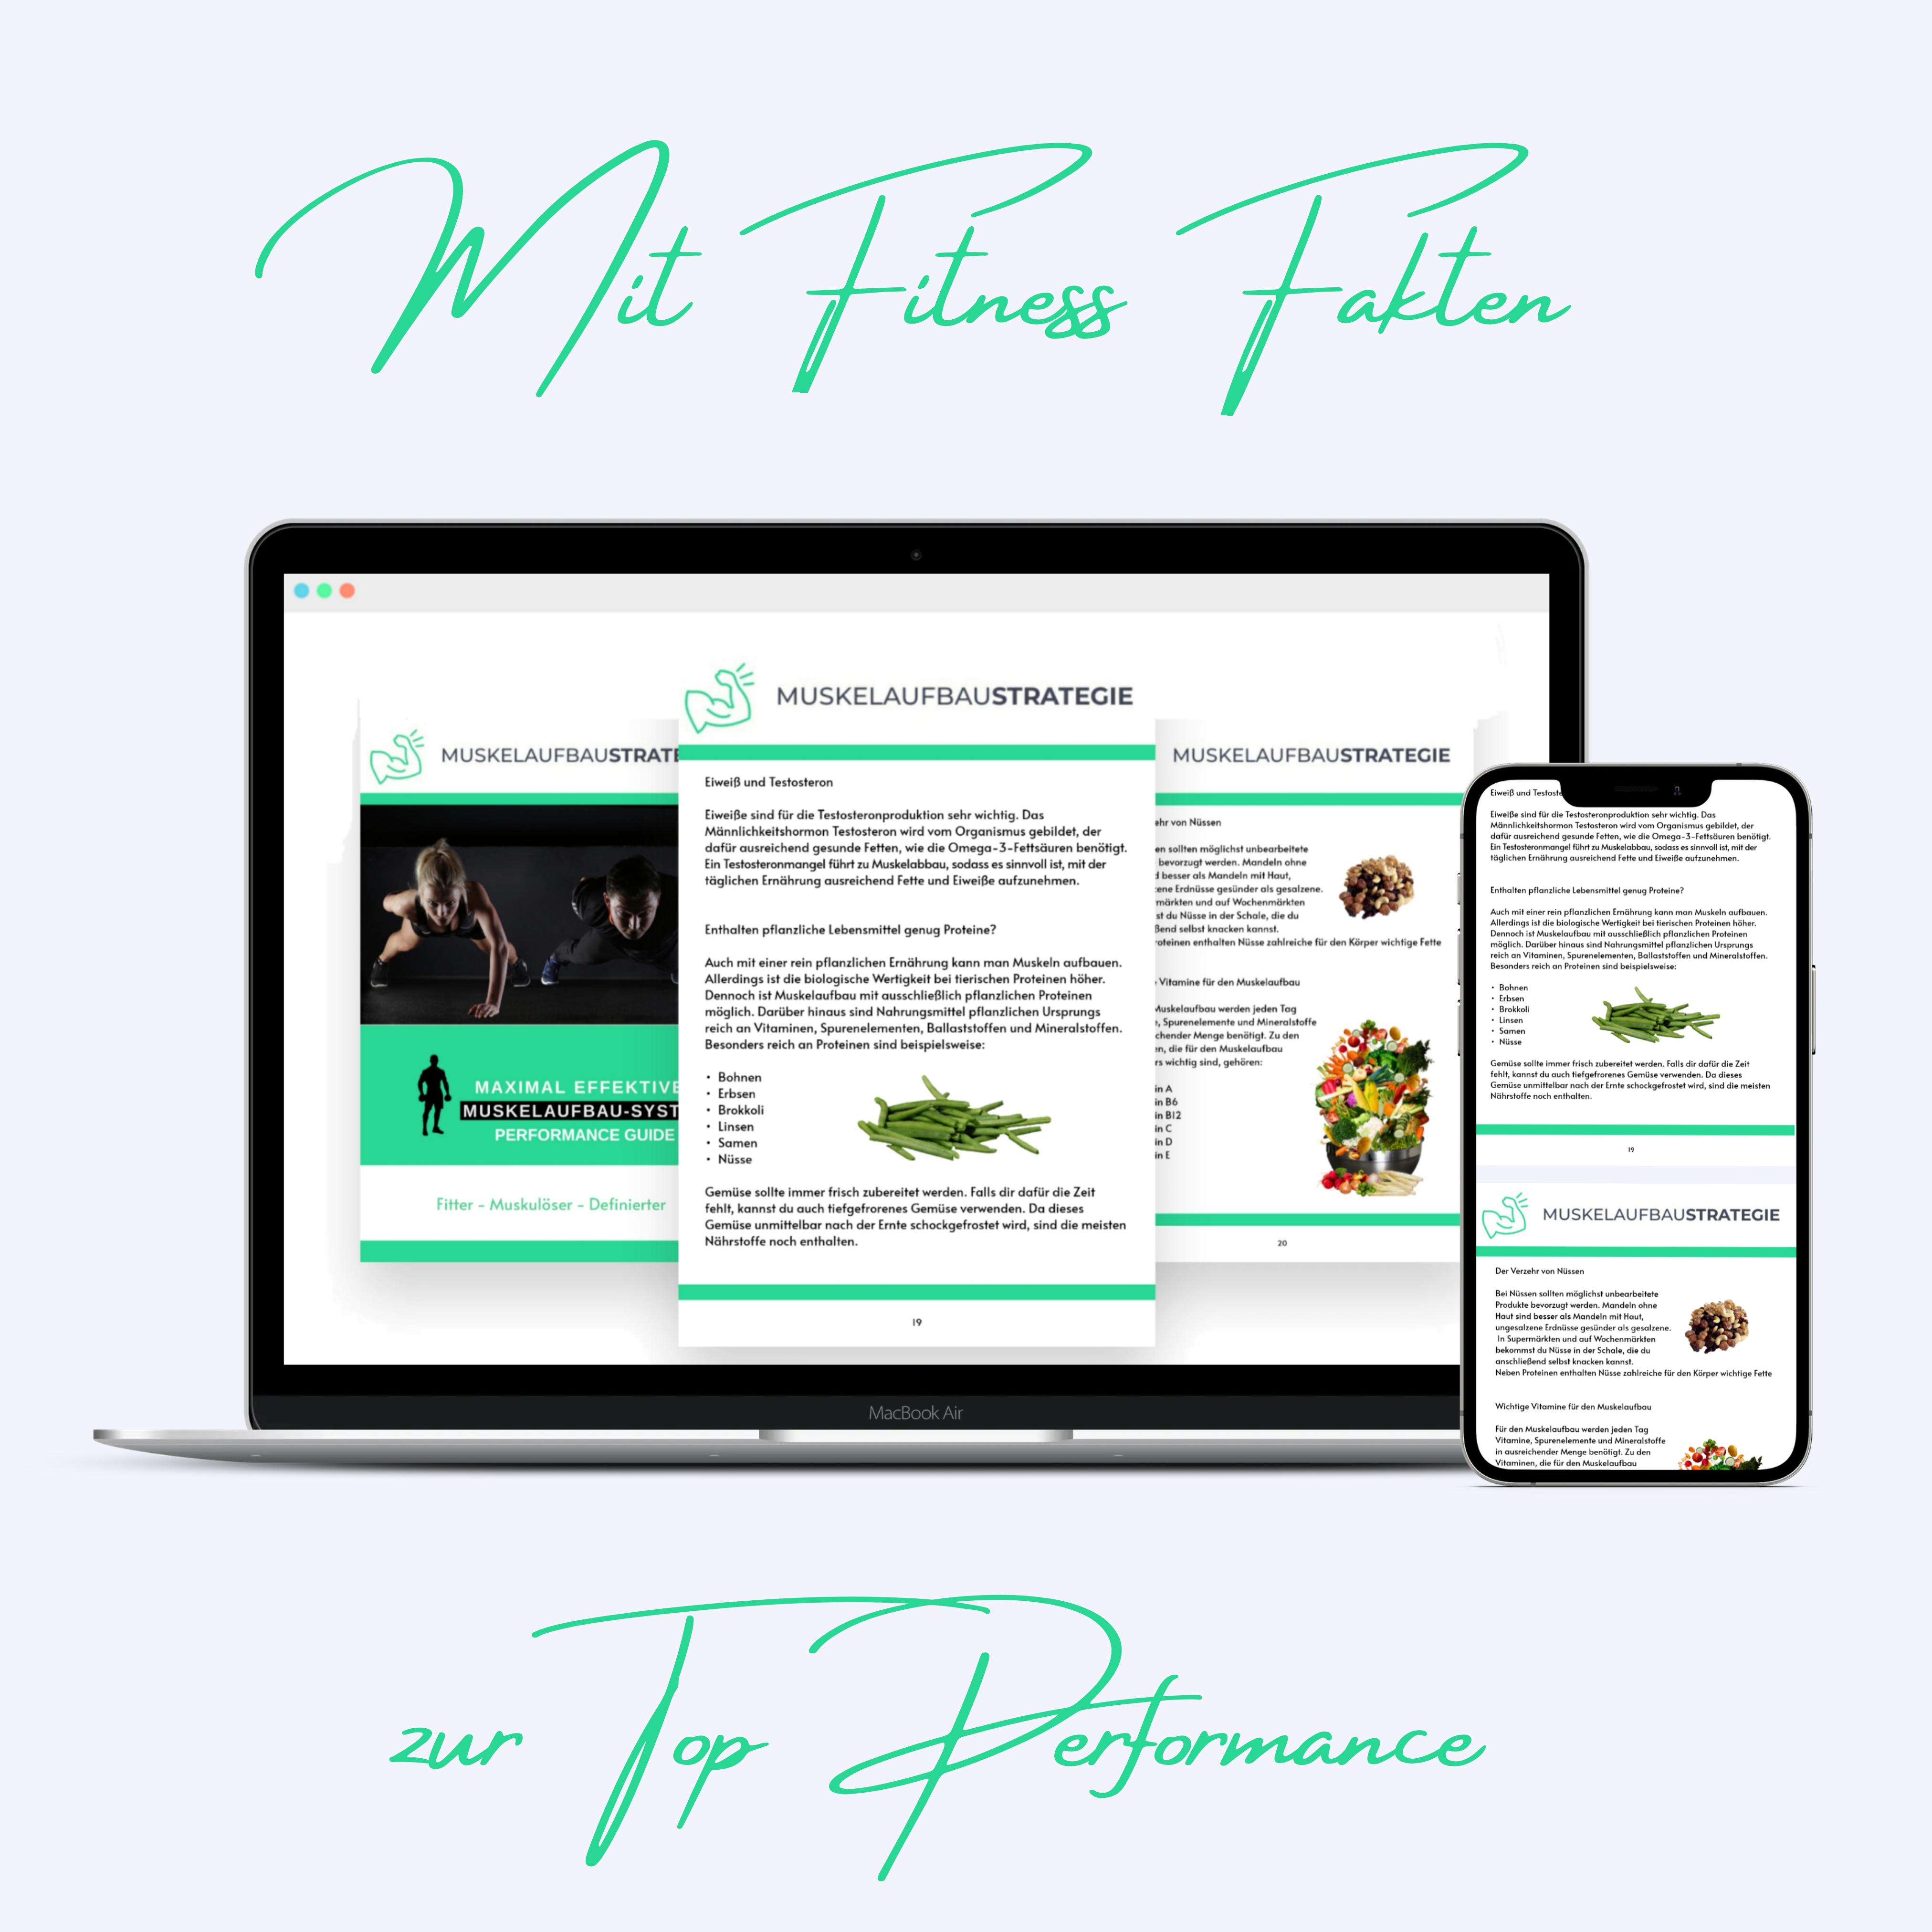 Fitnessbuch, Muskelaufbau, Ernährung, Fitnesstraining, download